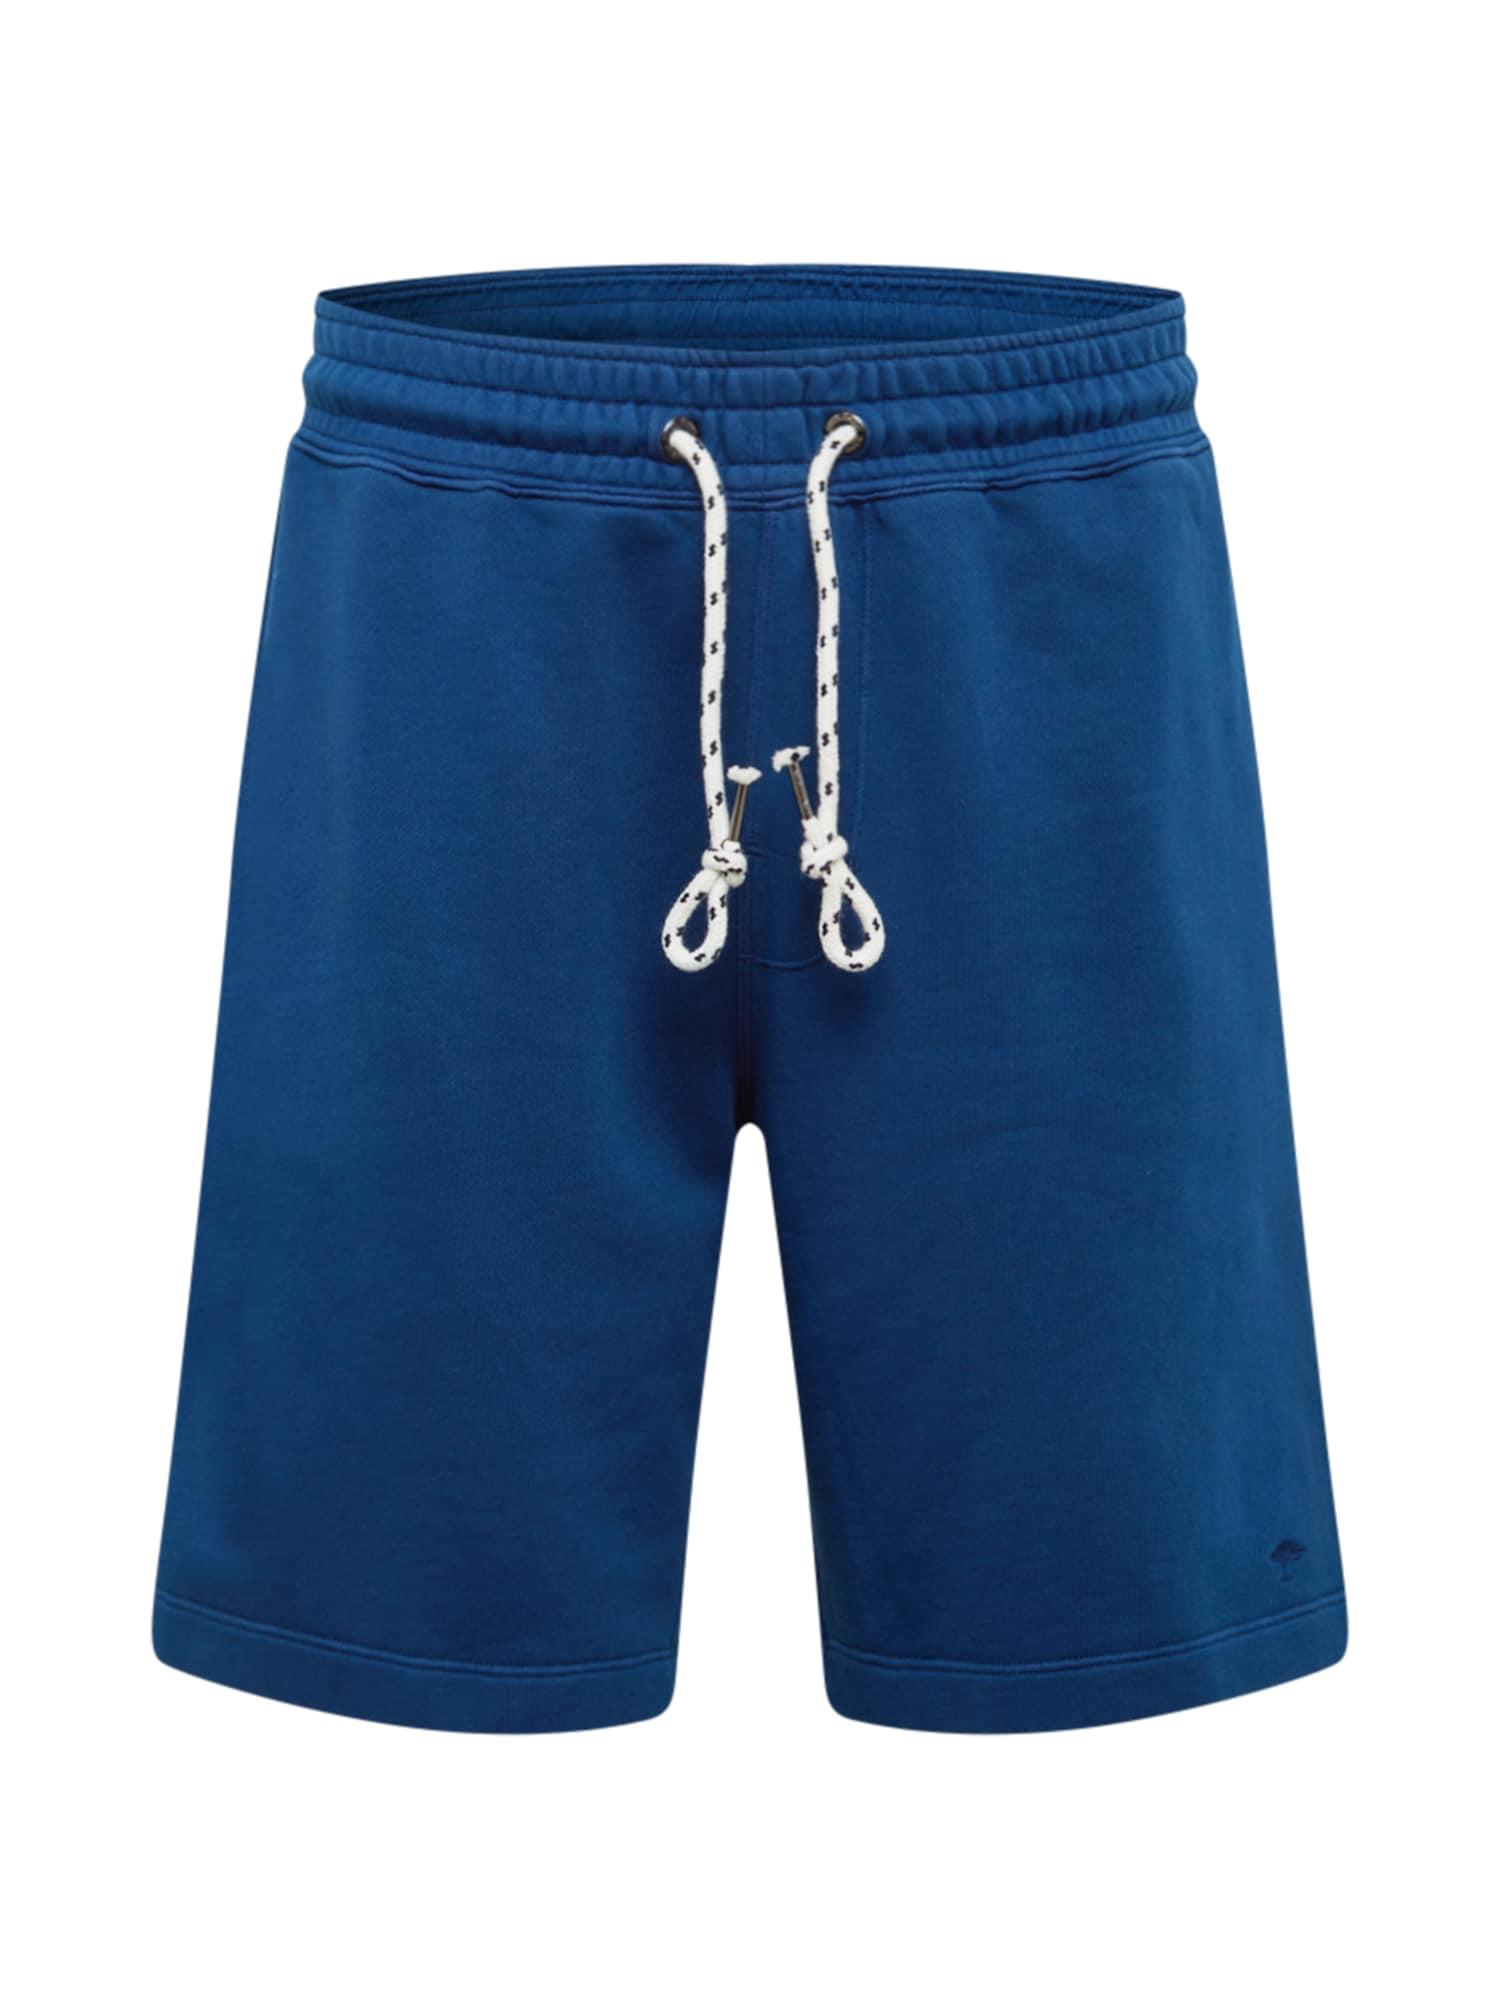 FYNCH-HATTON Kelnės 'CmiA' tamsiai mėlyna / balta